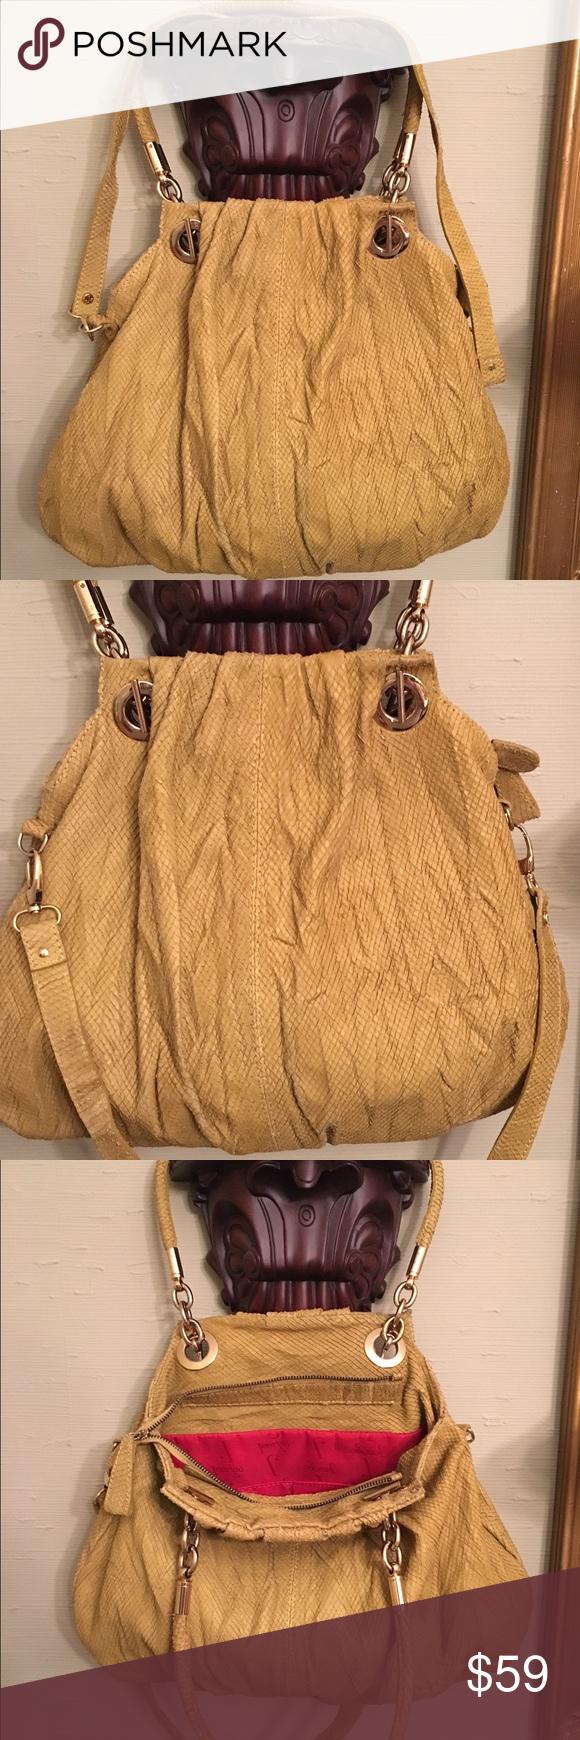 Jenrigo Italian Python Embossed Leather Bag Purse